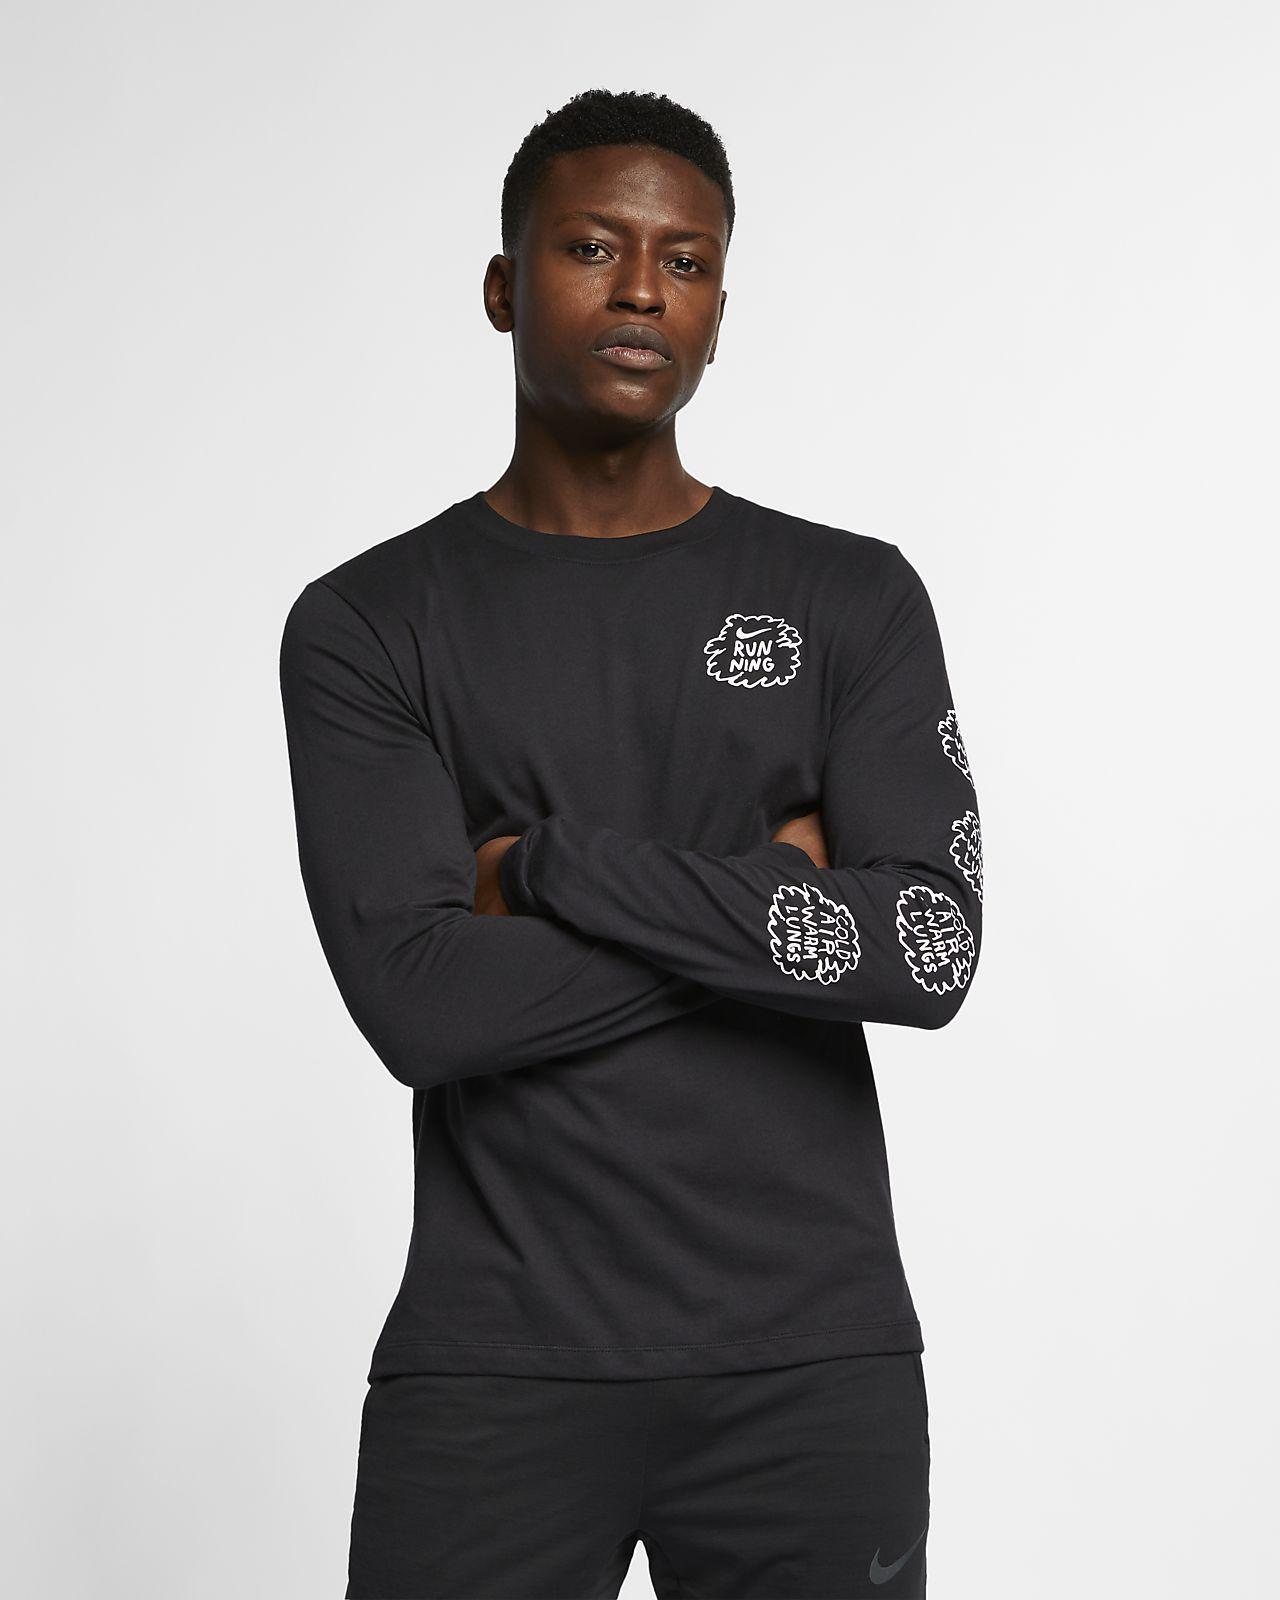 Nike Dri FIT Nathan Bell Men's Long Sleeve Running T Shirt